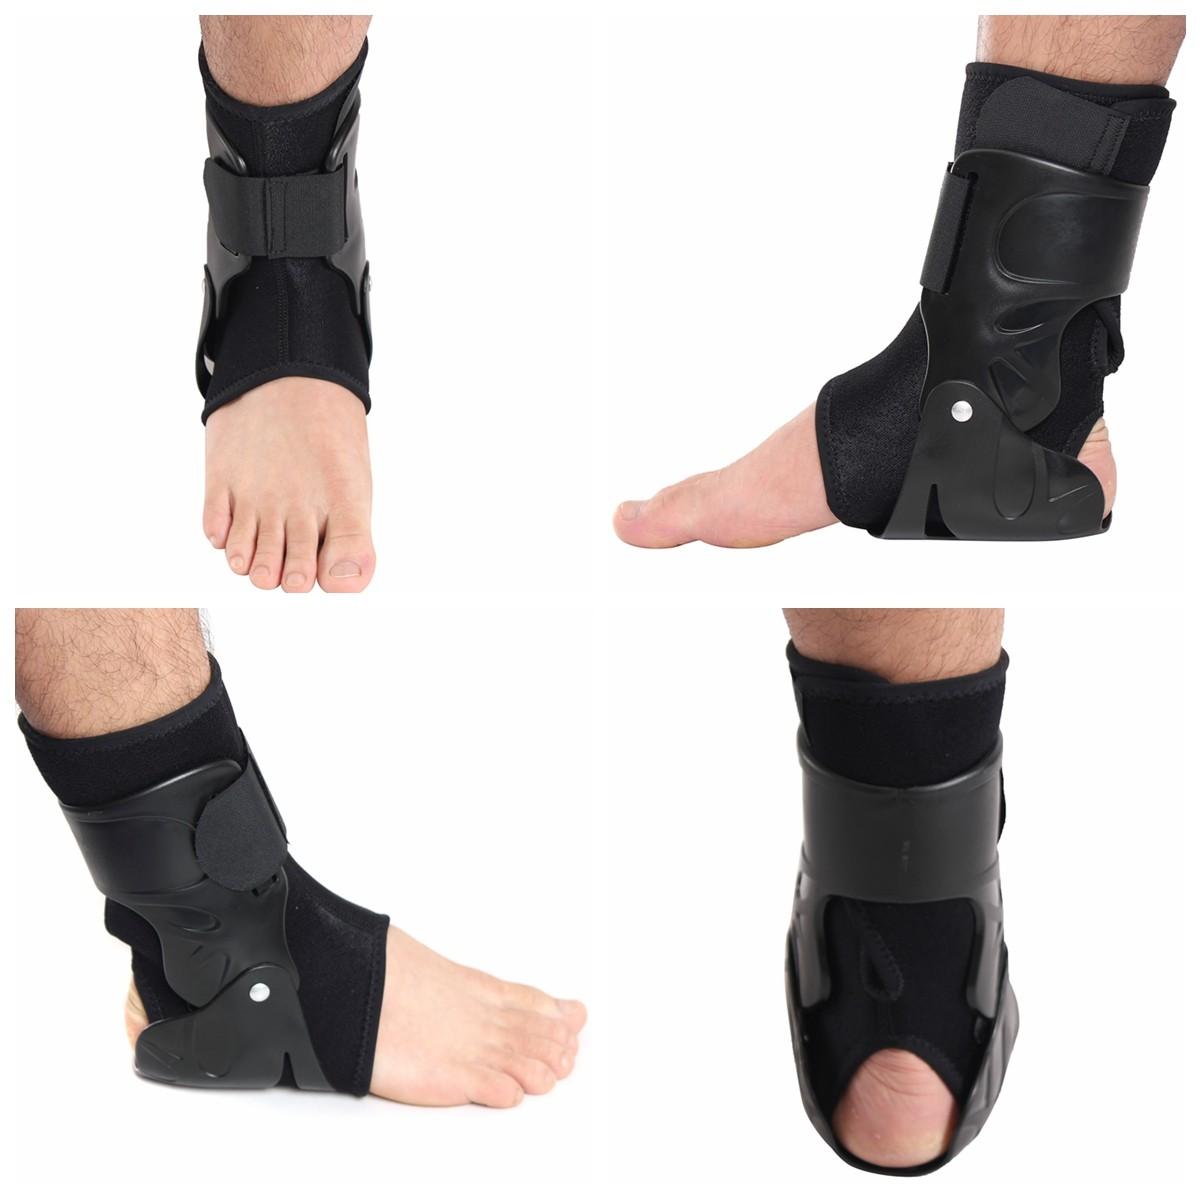 medical ankle support brace foot guard sprains injury wrap elastic splint strap ebay